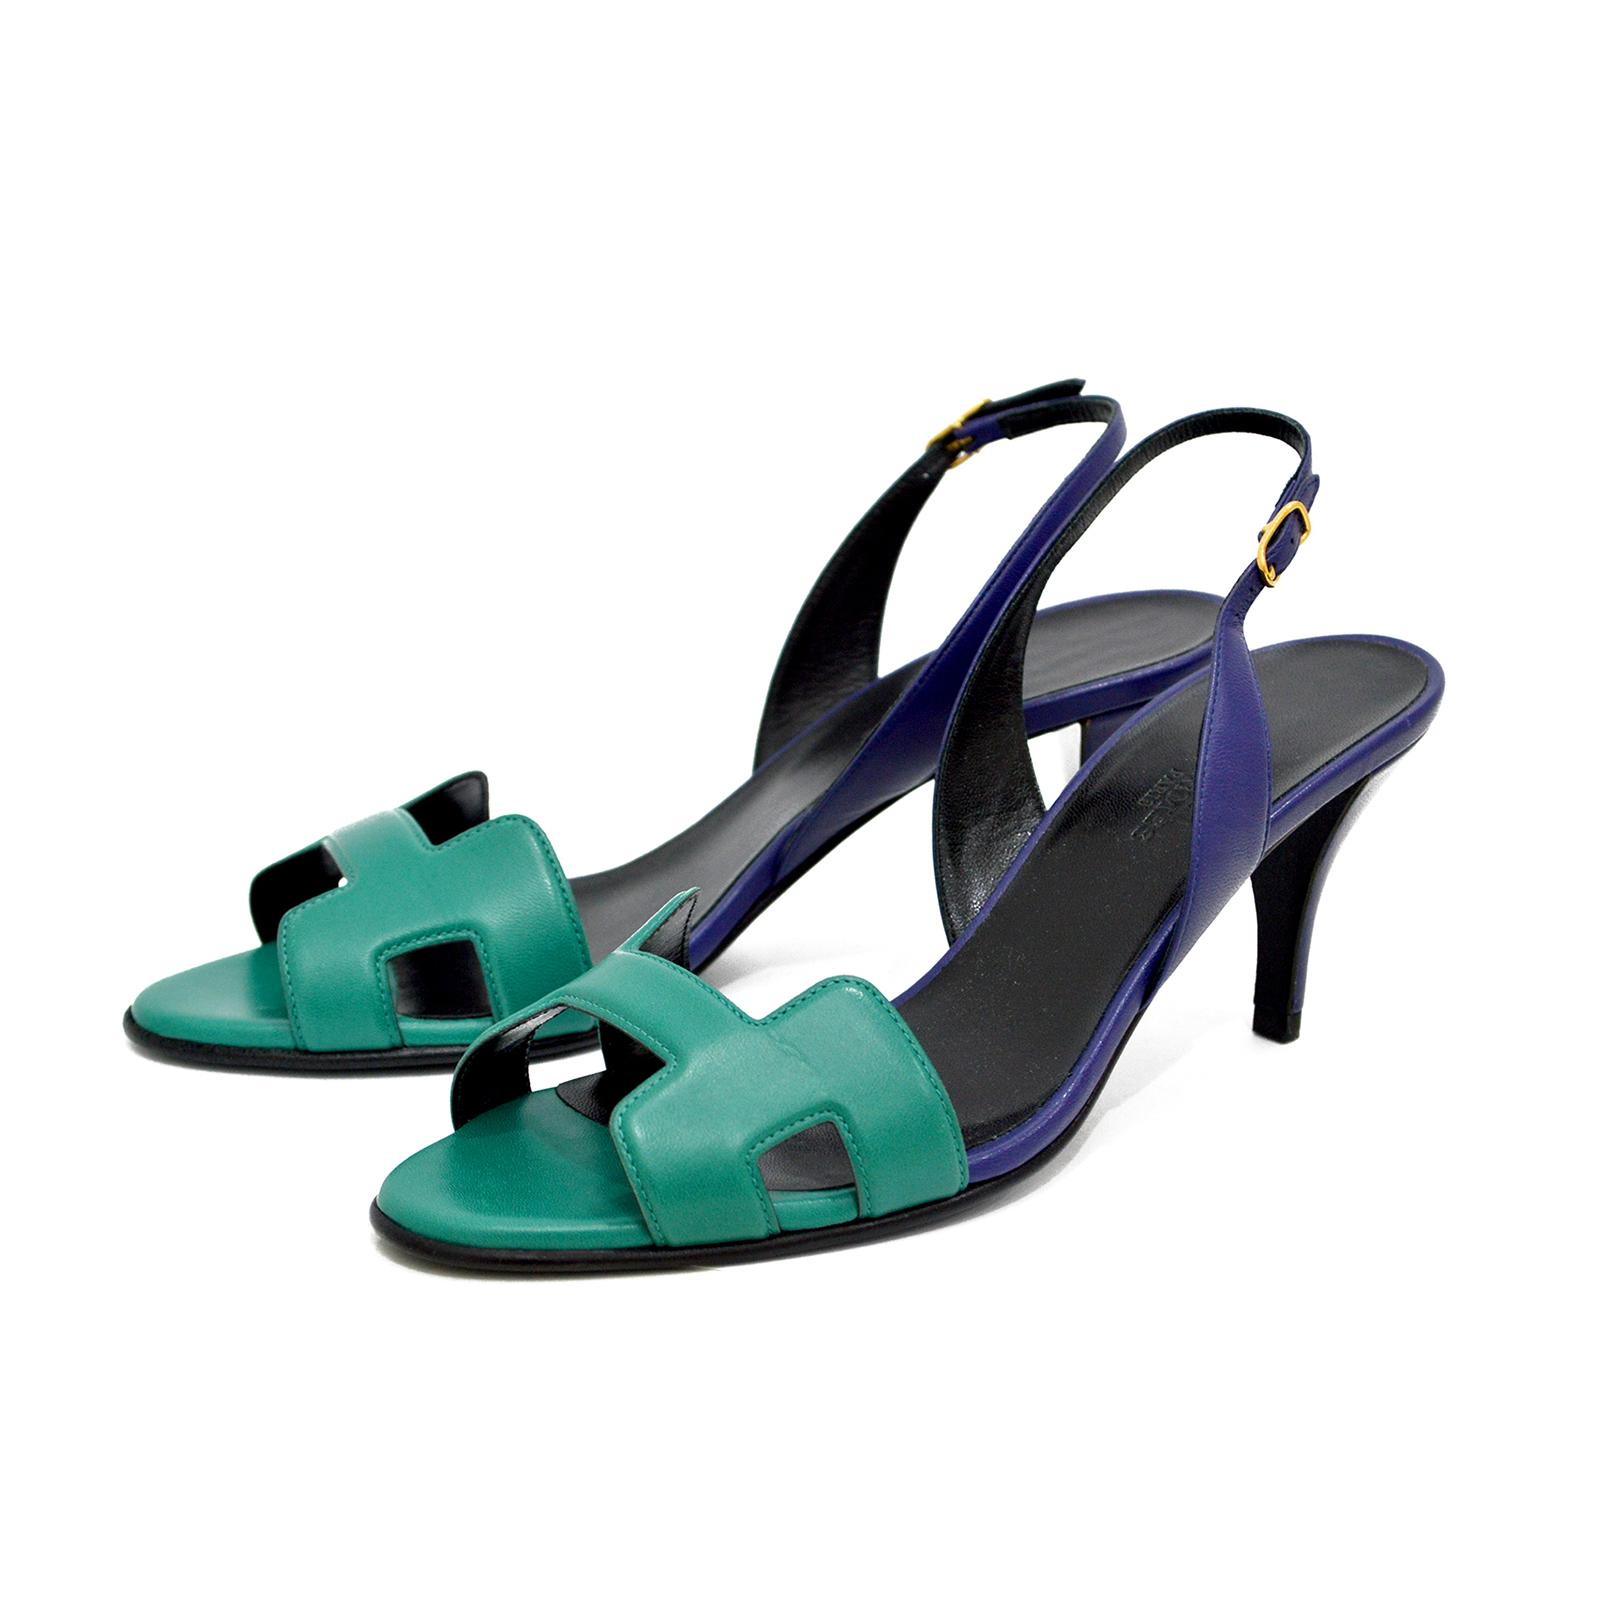 6da37375c07 Hermes Night 70 Shoes